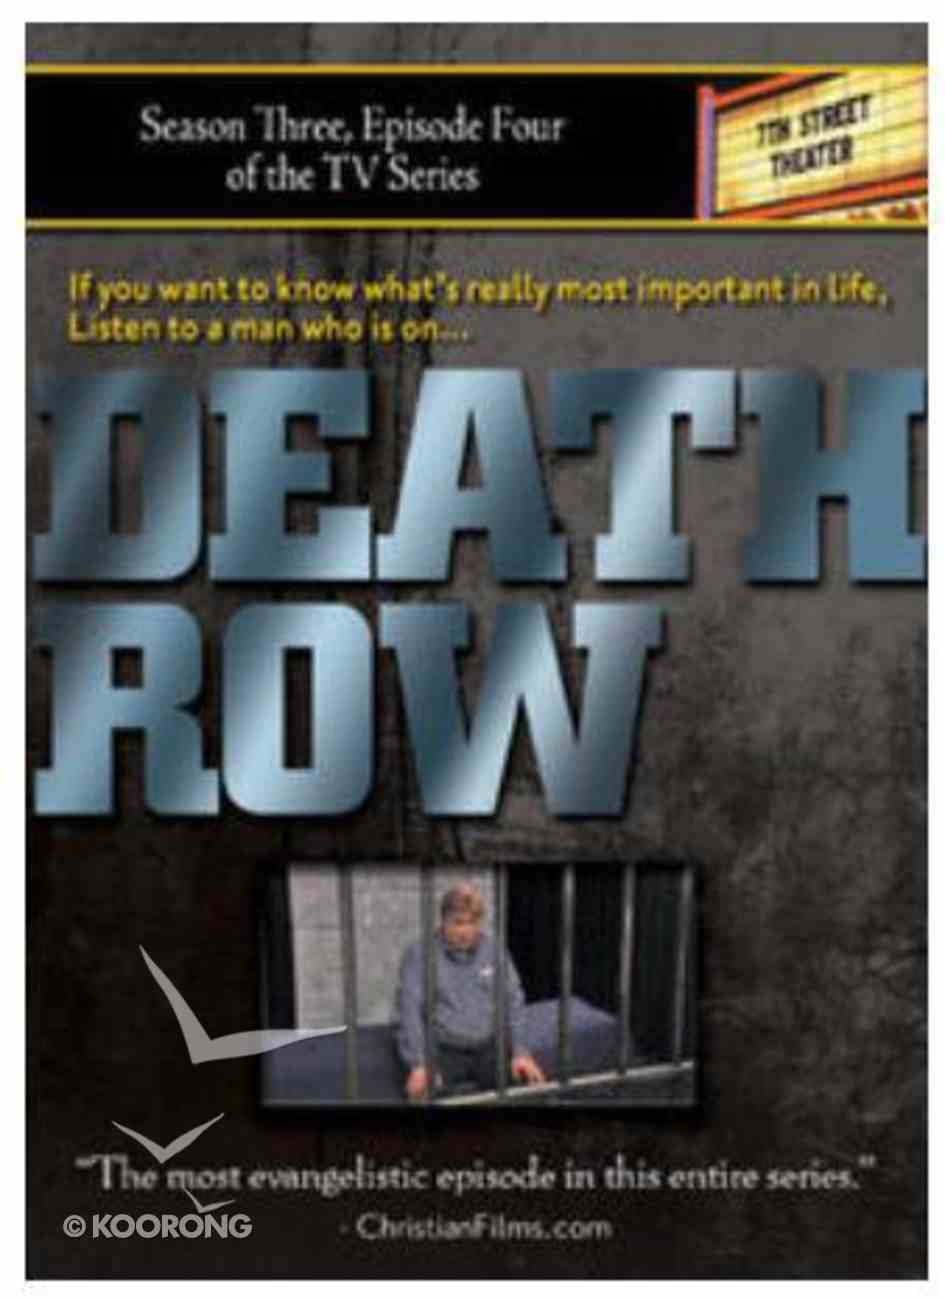 Death Row (28Mins) (Season 3, Episode 4) (7th Street Theatre Series) DVD